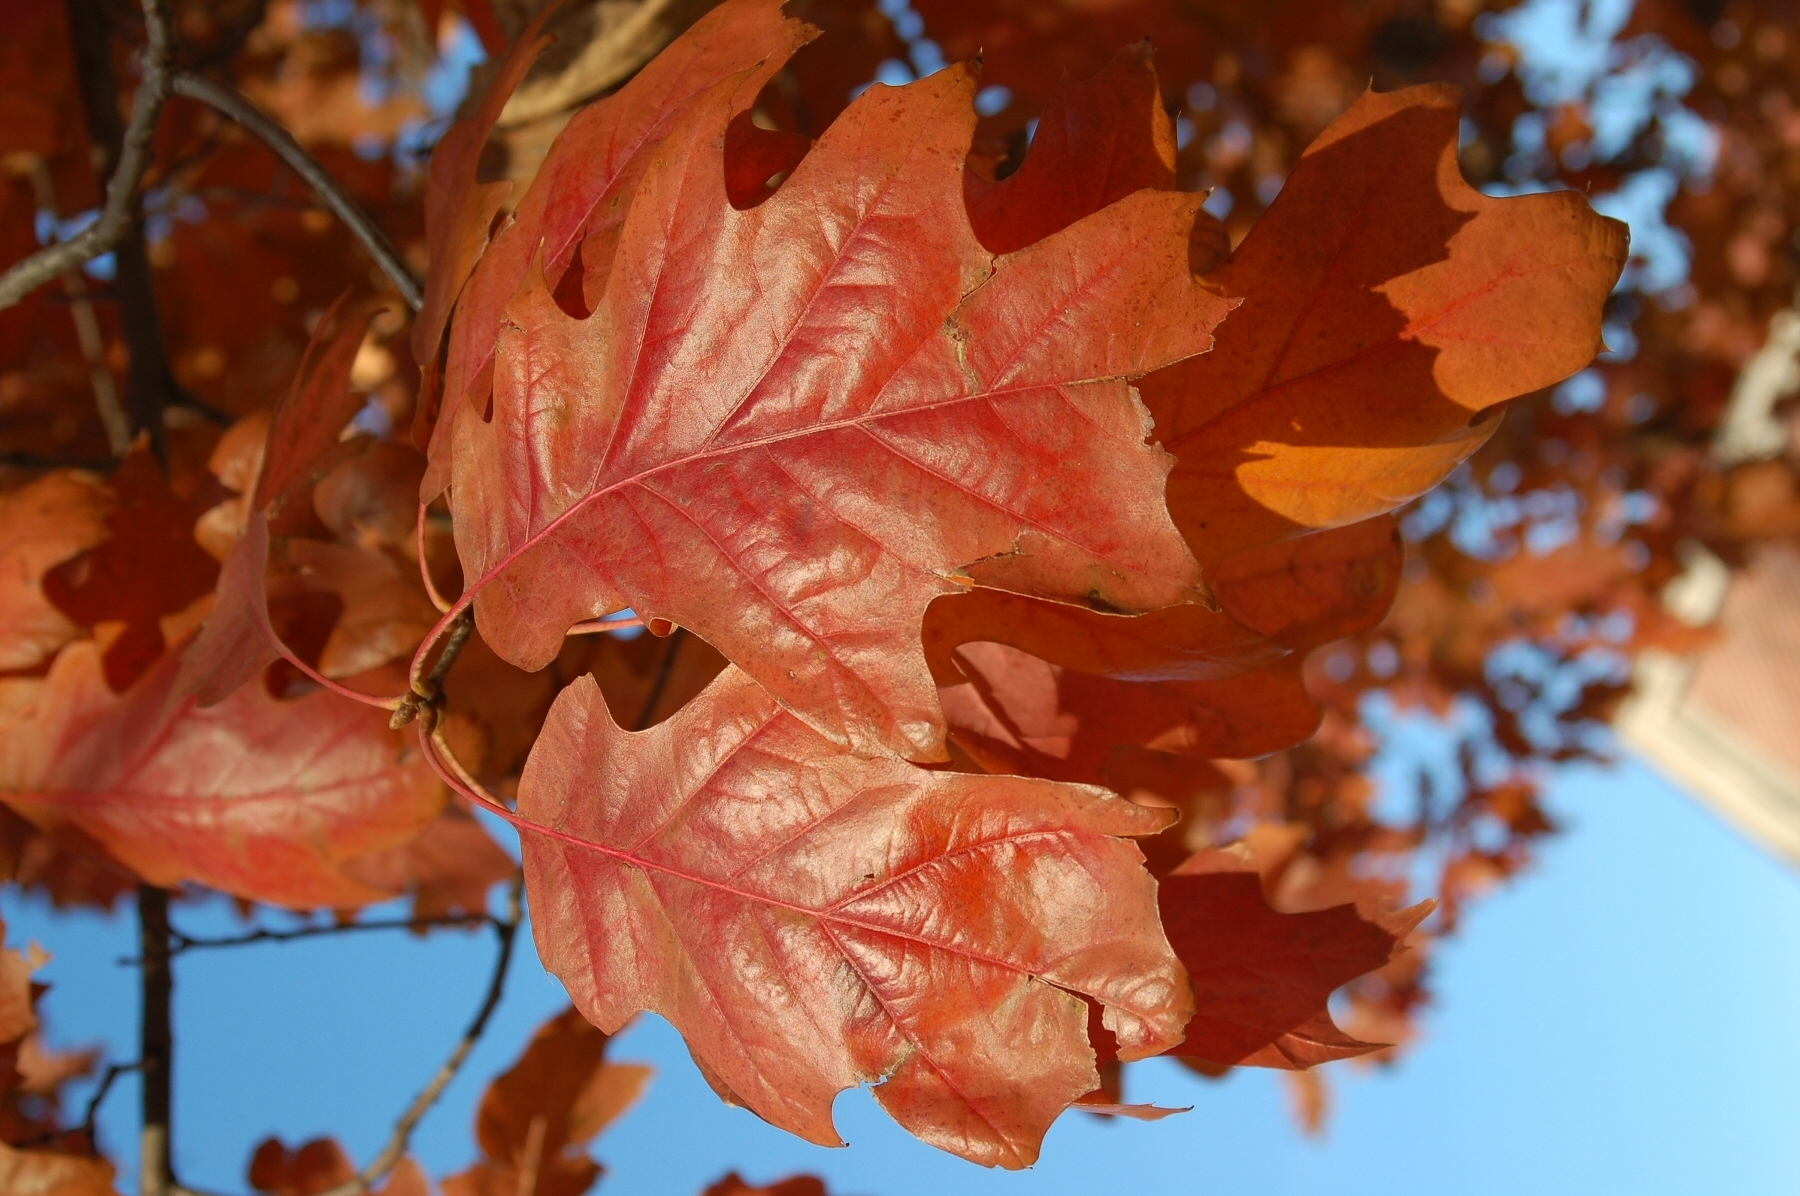 Red oak leaves.